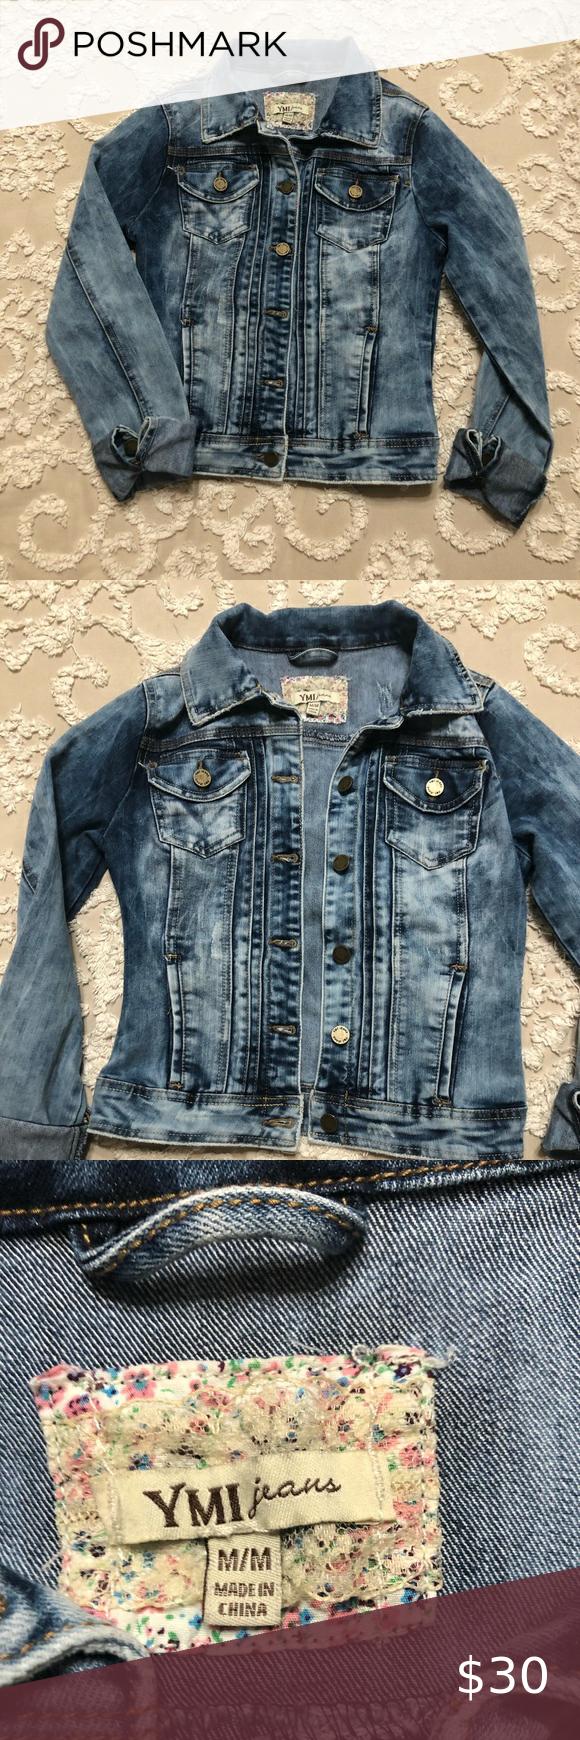 Ymi Junior Jean Jacket So Cute Cute Jean Jackets Juniors Jeans Fitted Denim Jacket [ 1740 x 580 Pixel ]